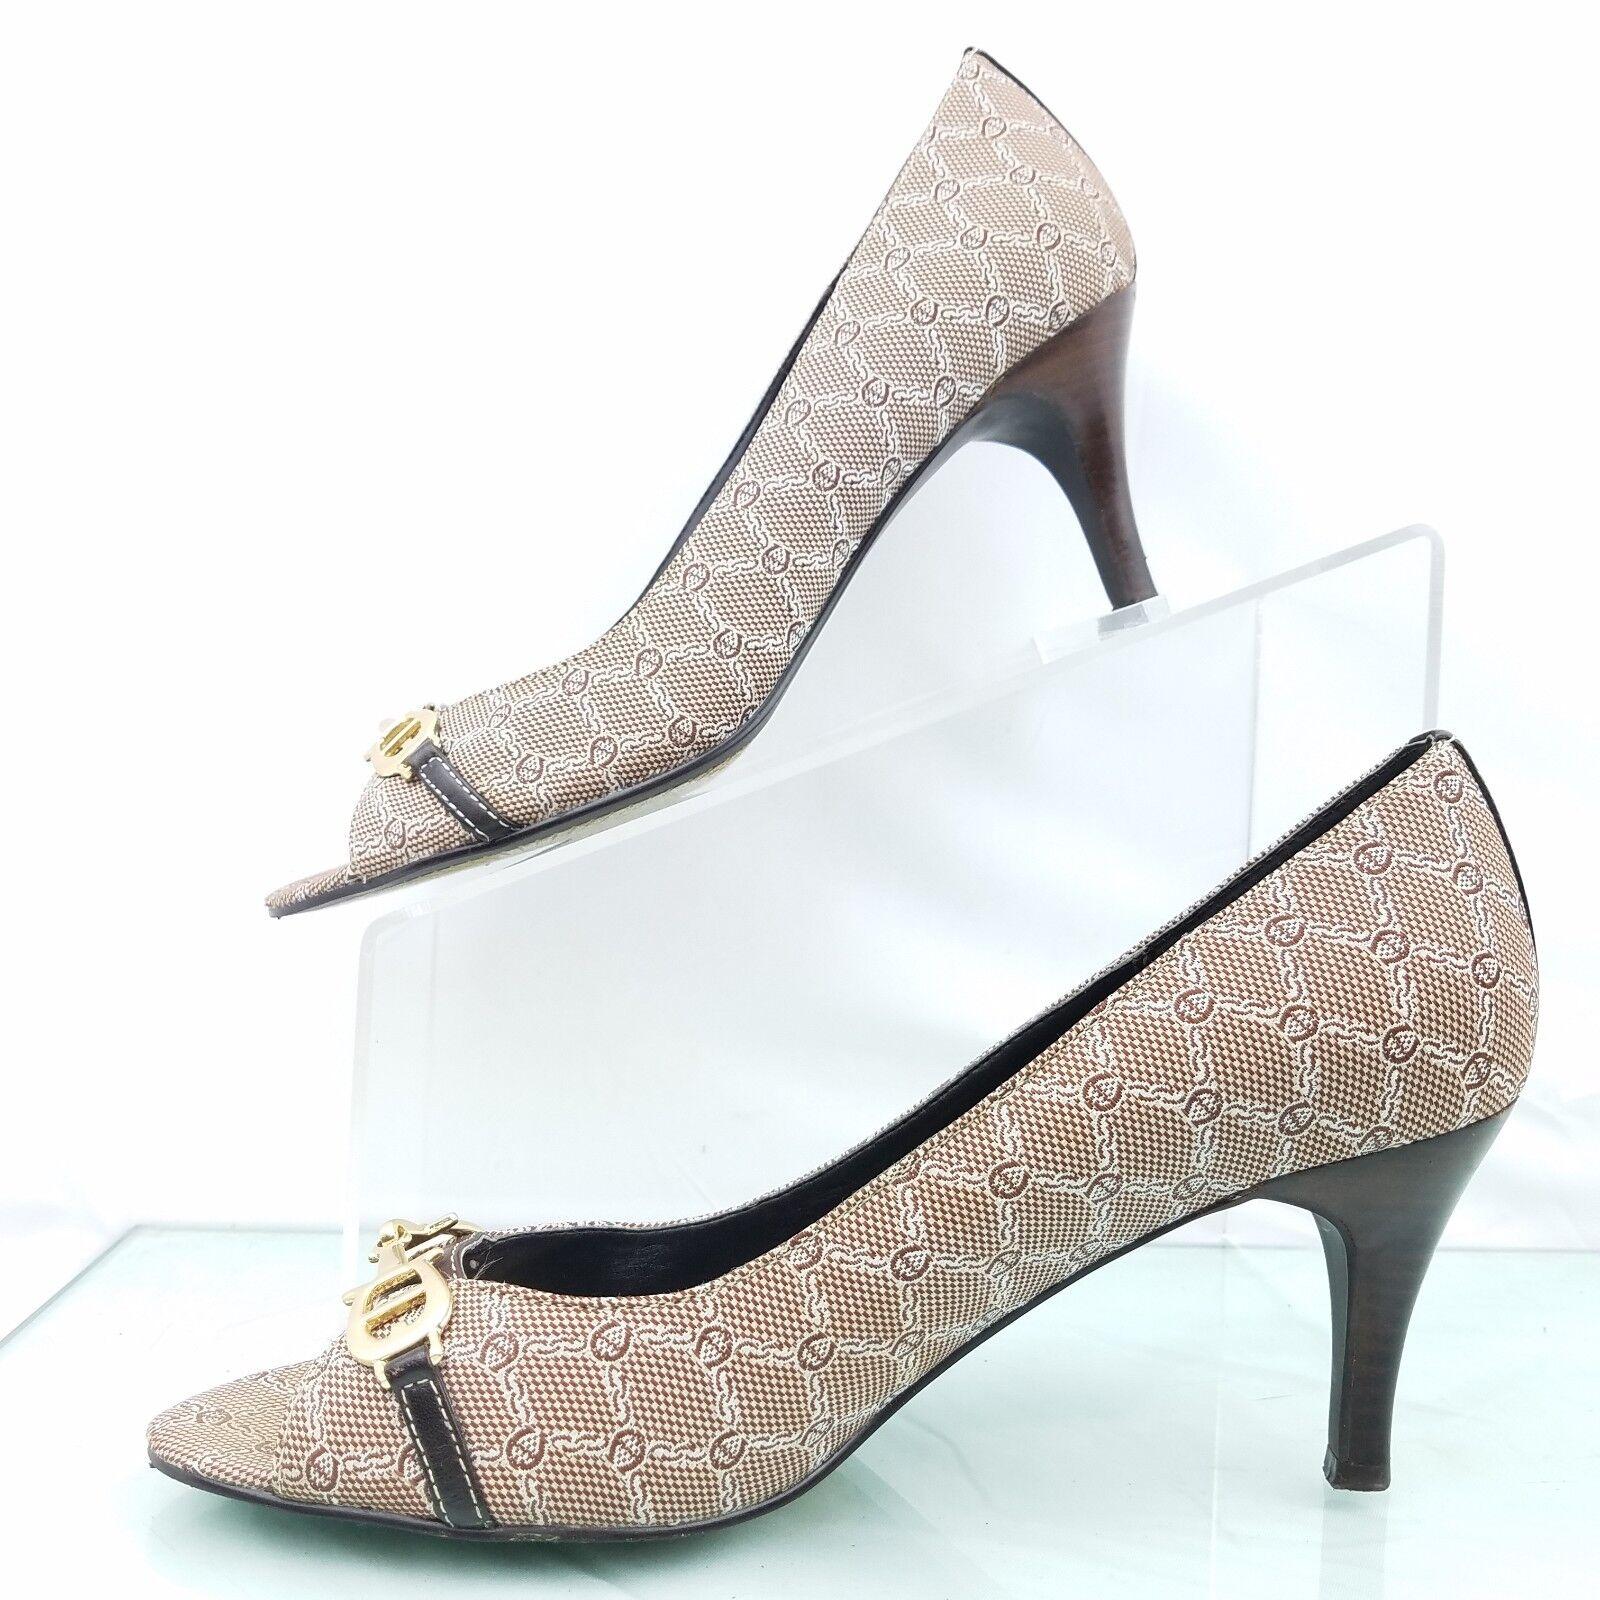 Aetienne Toe Aigner Womens Cherise Peep Toe Aetienne Pump Horse Bit Leather/Fabric Size 7.5 M b6b47b